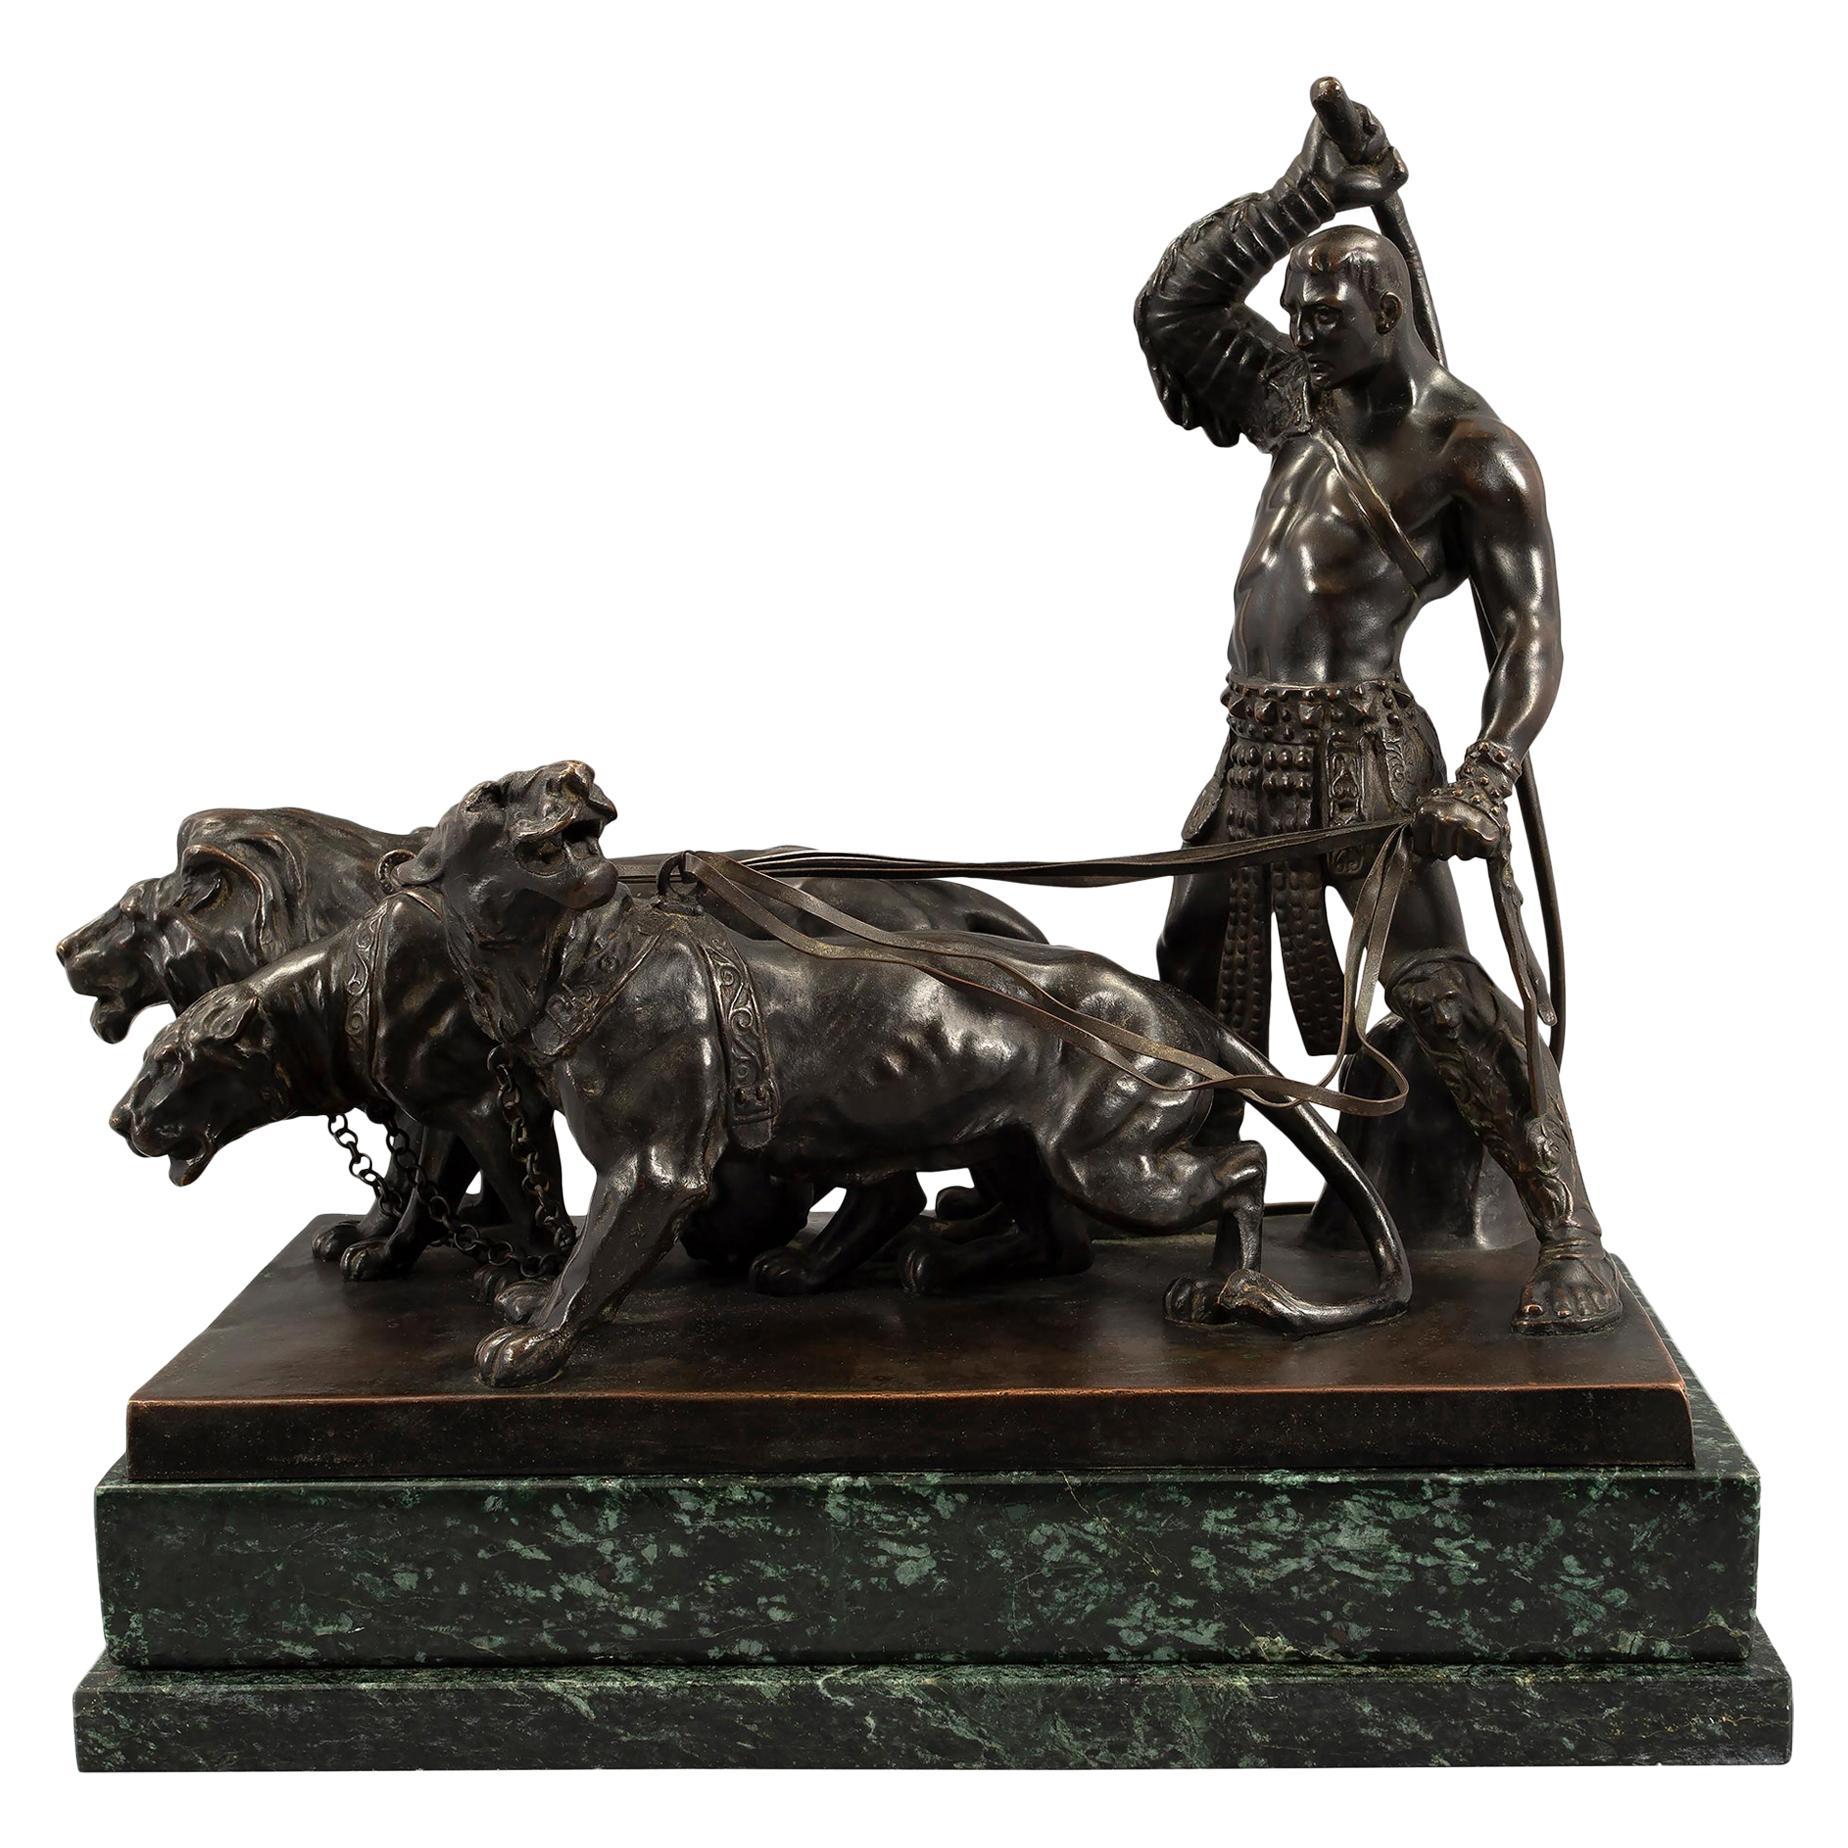 Austrian 19th Century Patinated Bronze and Vert De Patricia Marble Statue